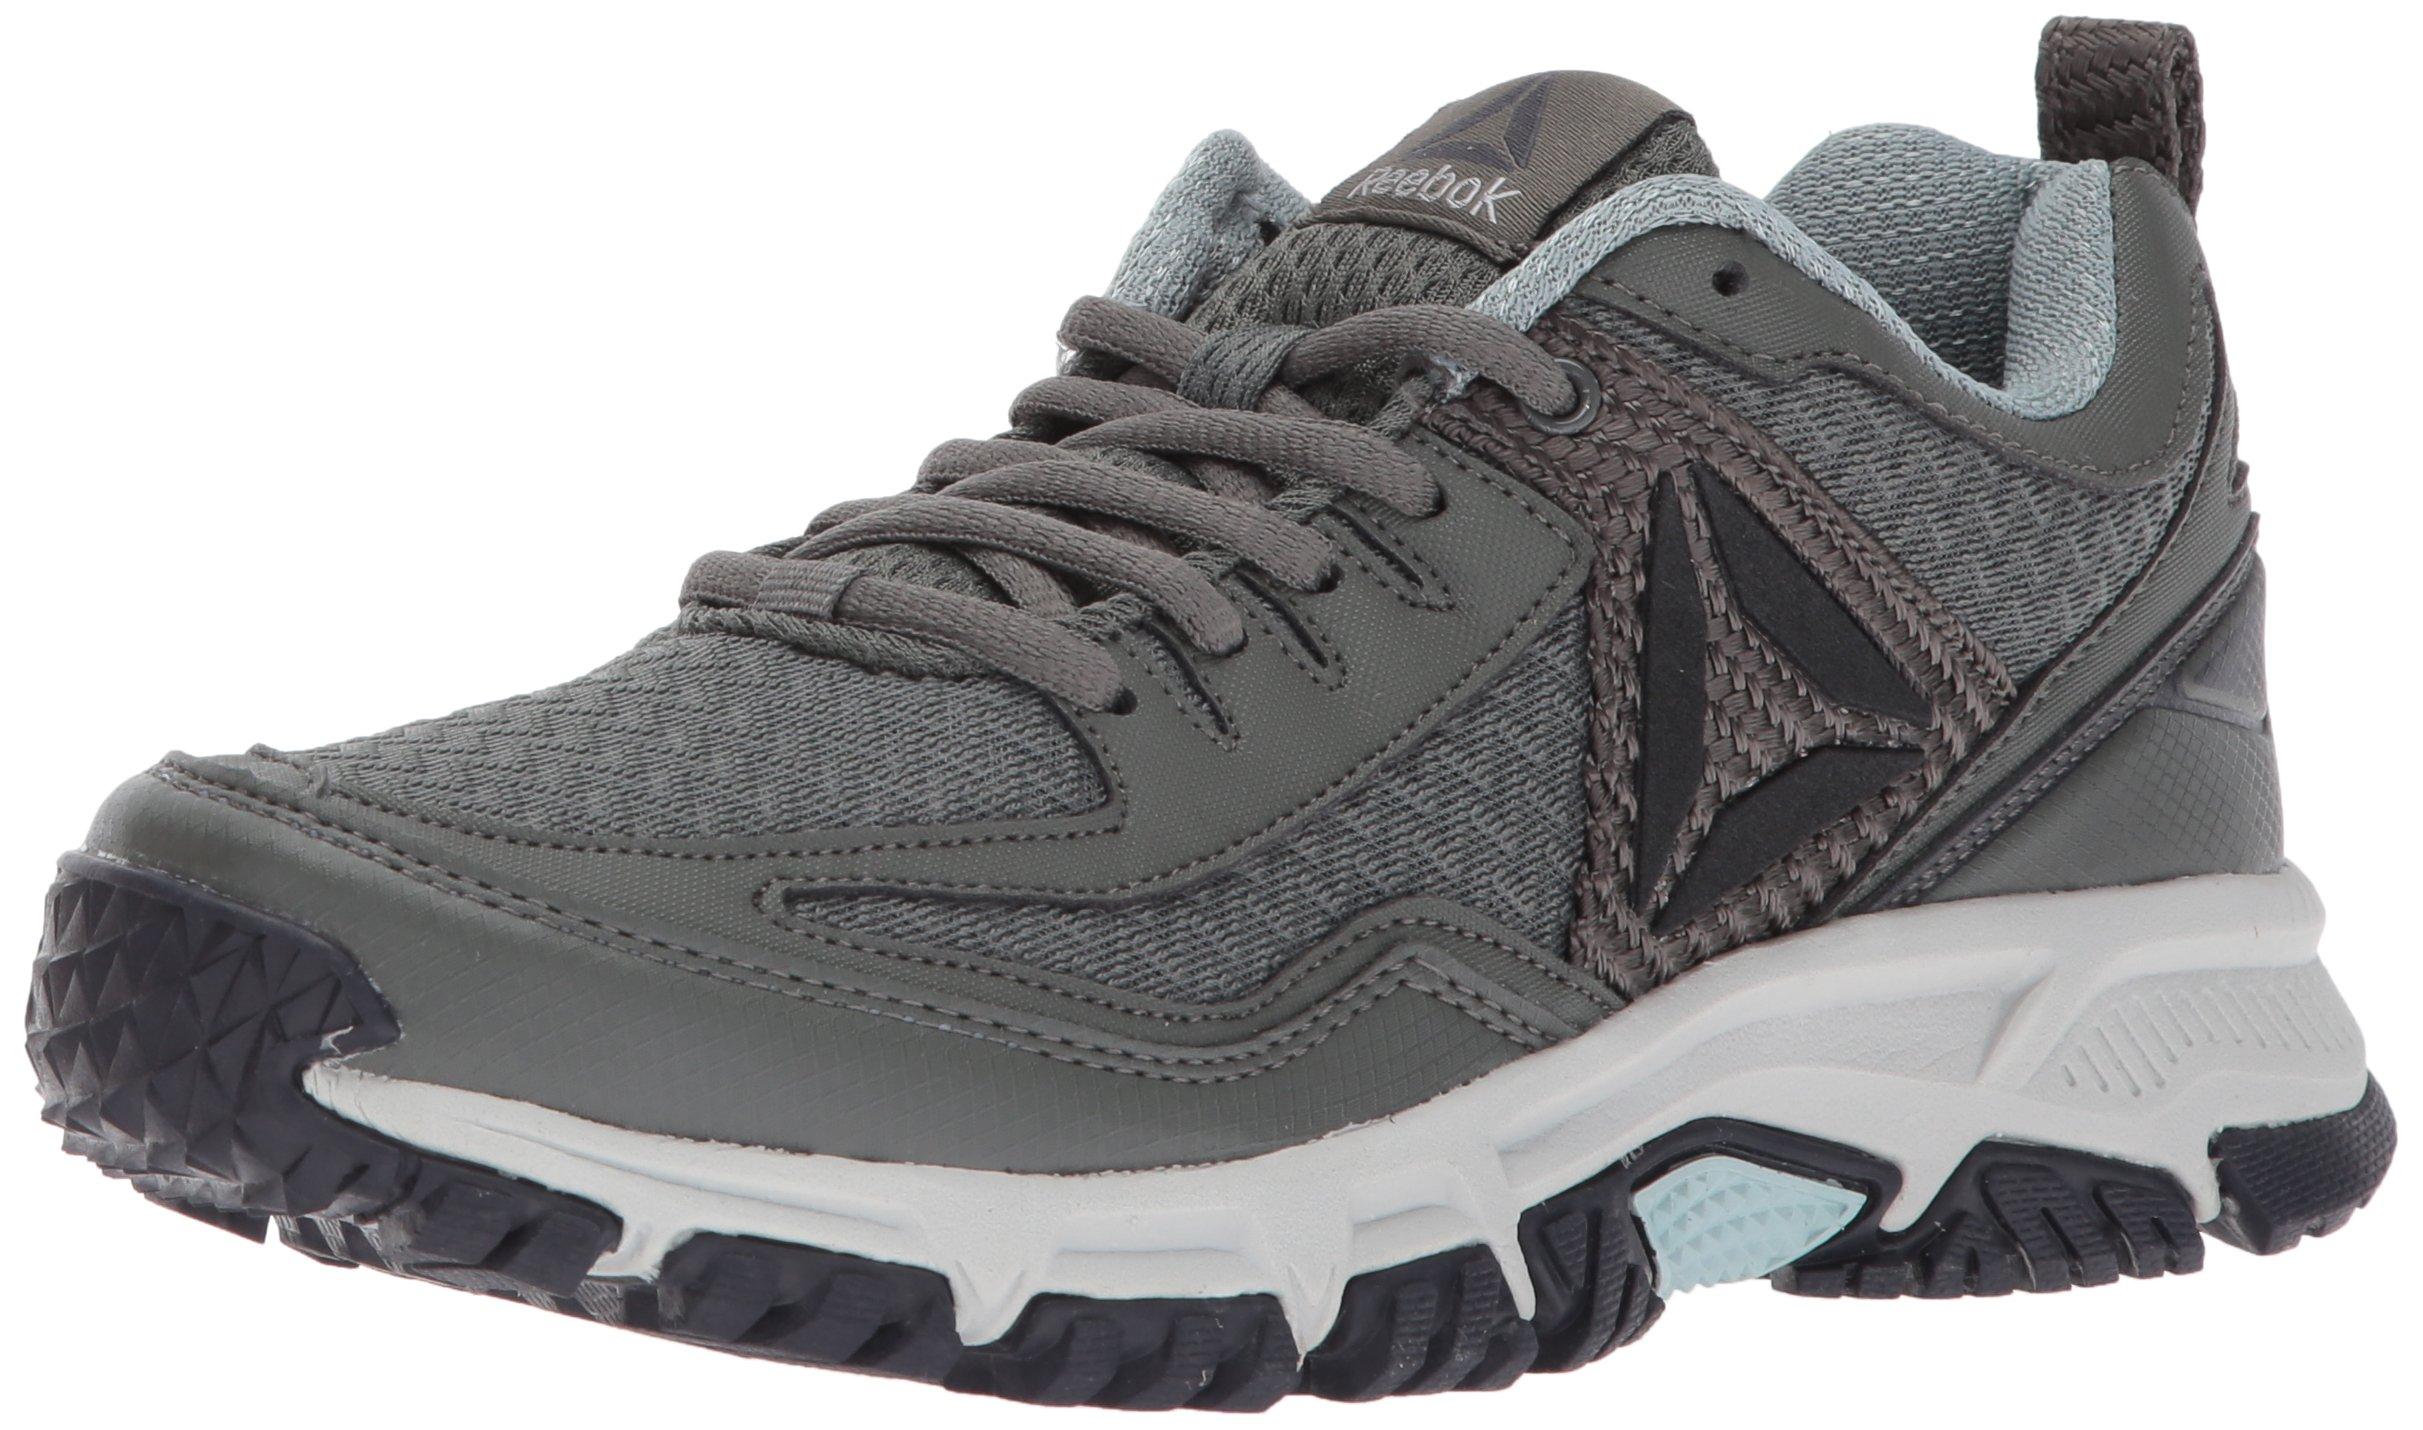 Reebok Women's Ridgerider Trail 2.0 Track Shoe, Ironstone/Seaside Grey/Coal/Skull Grey/Black/Silver/Pewter, 7.5 M US